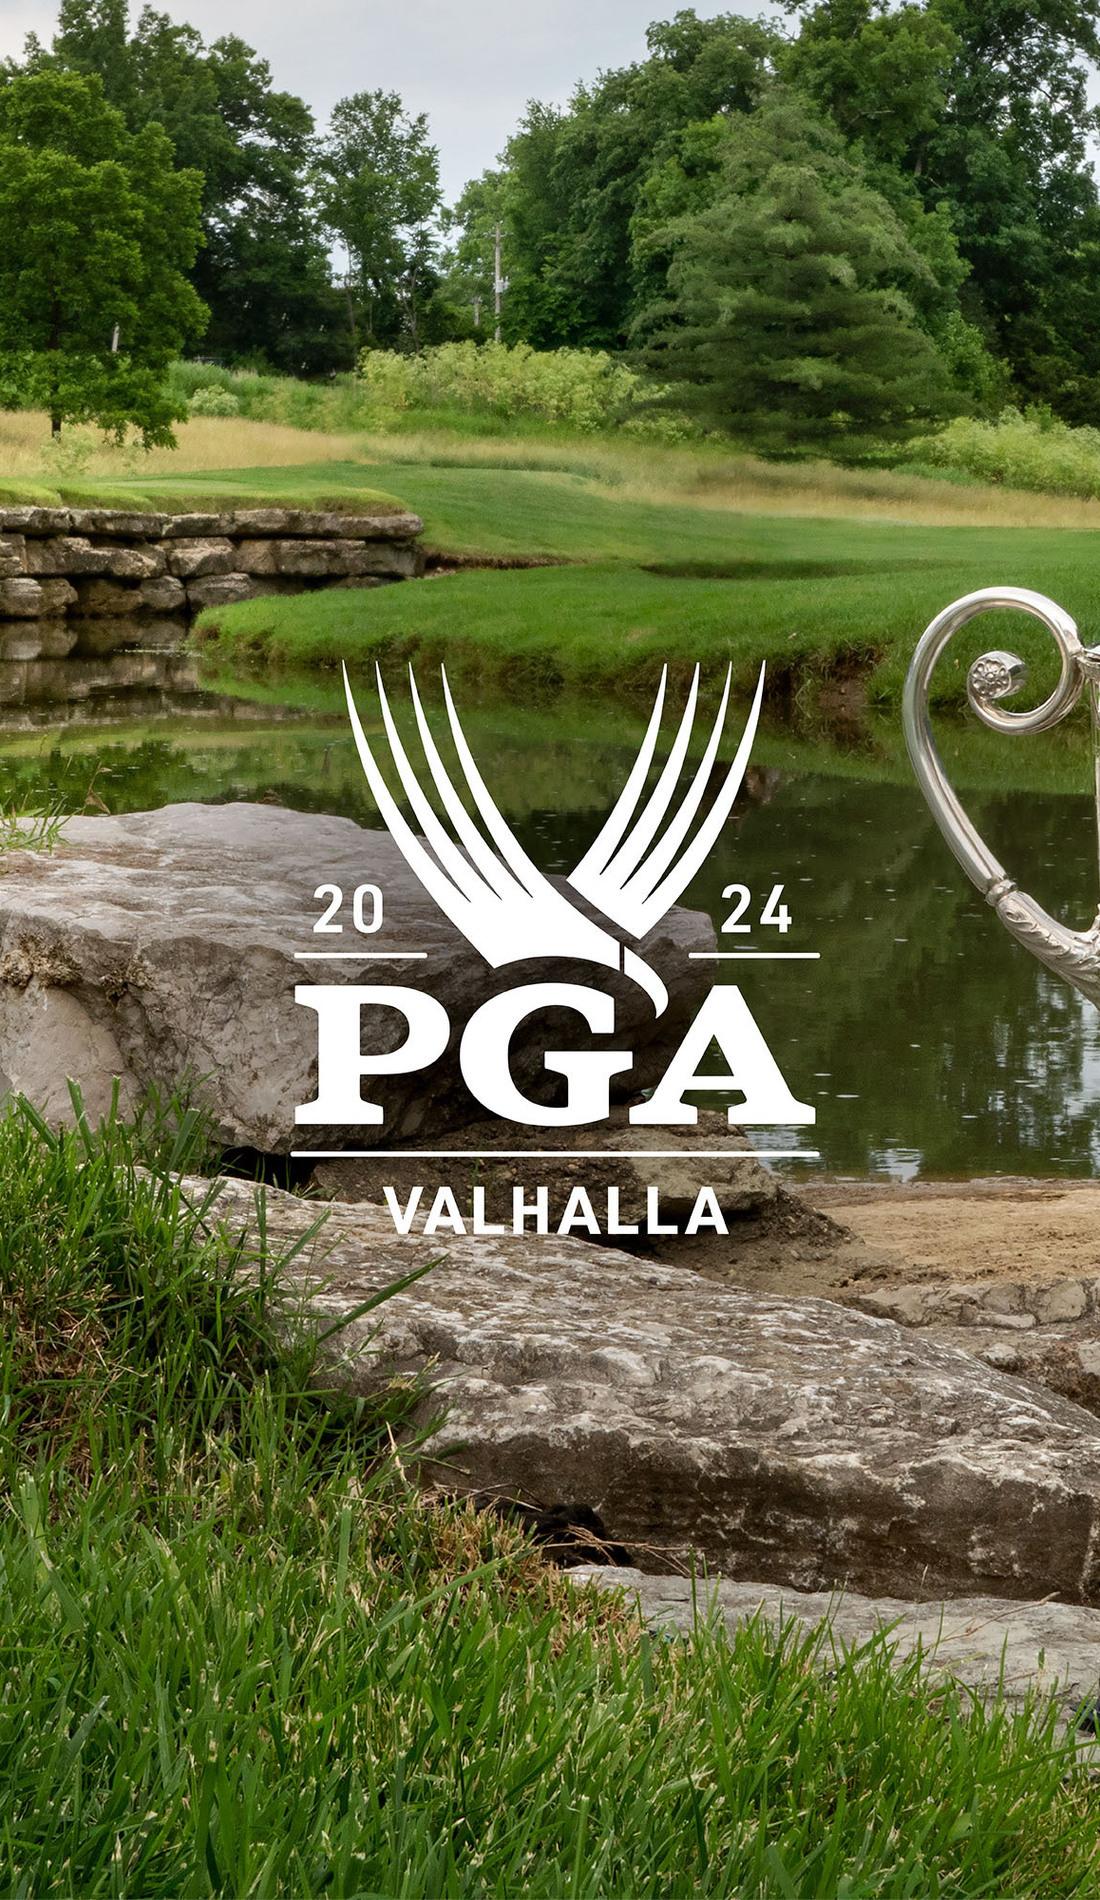 A PGA Championship live event